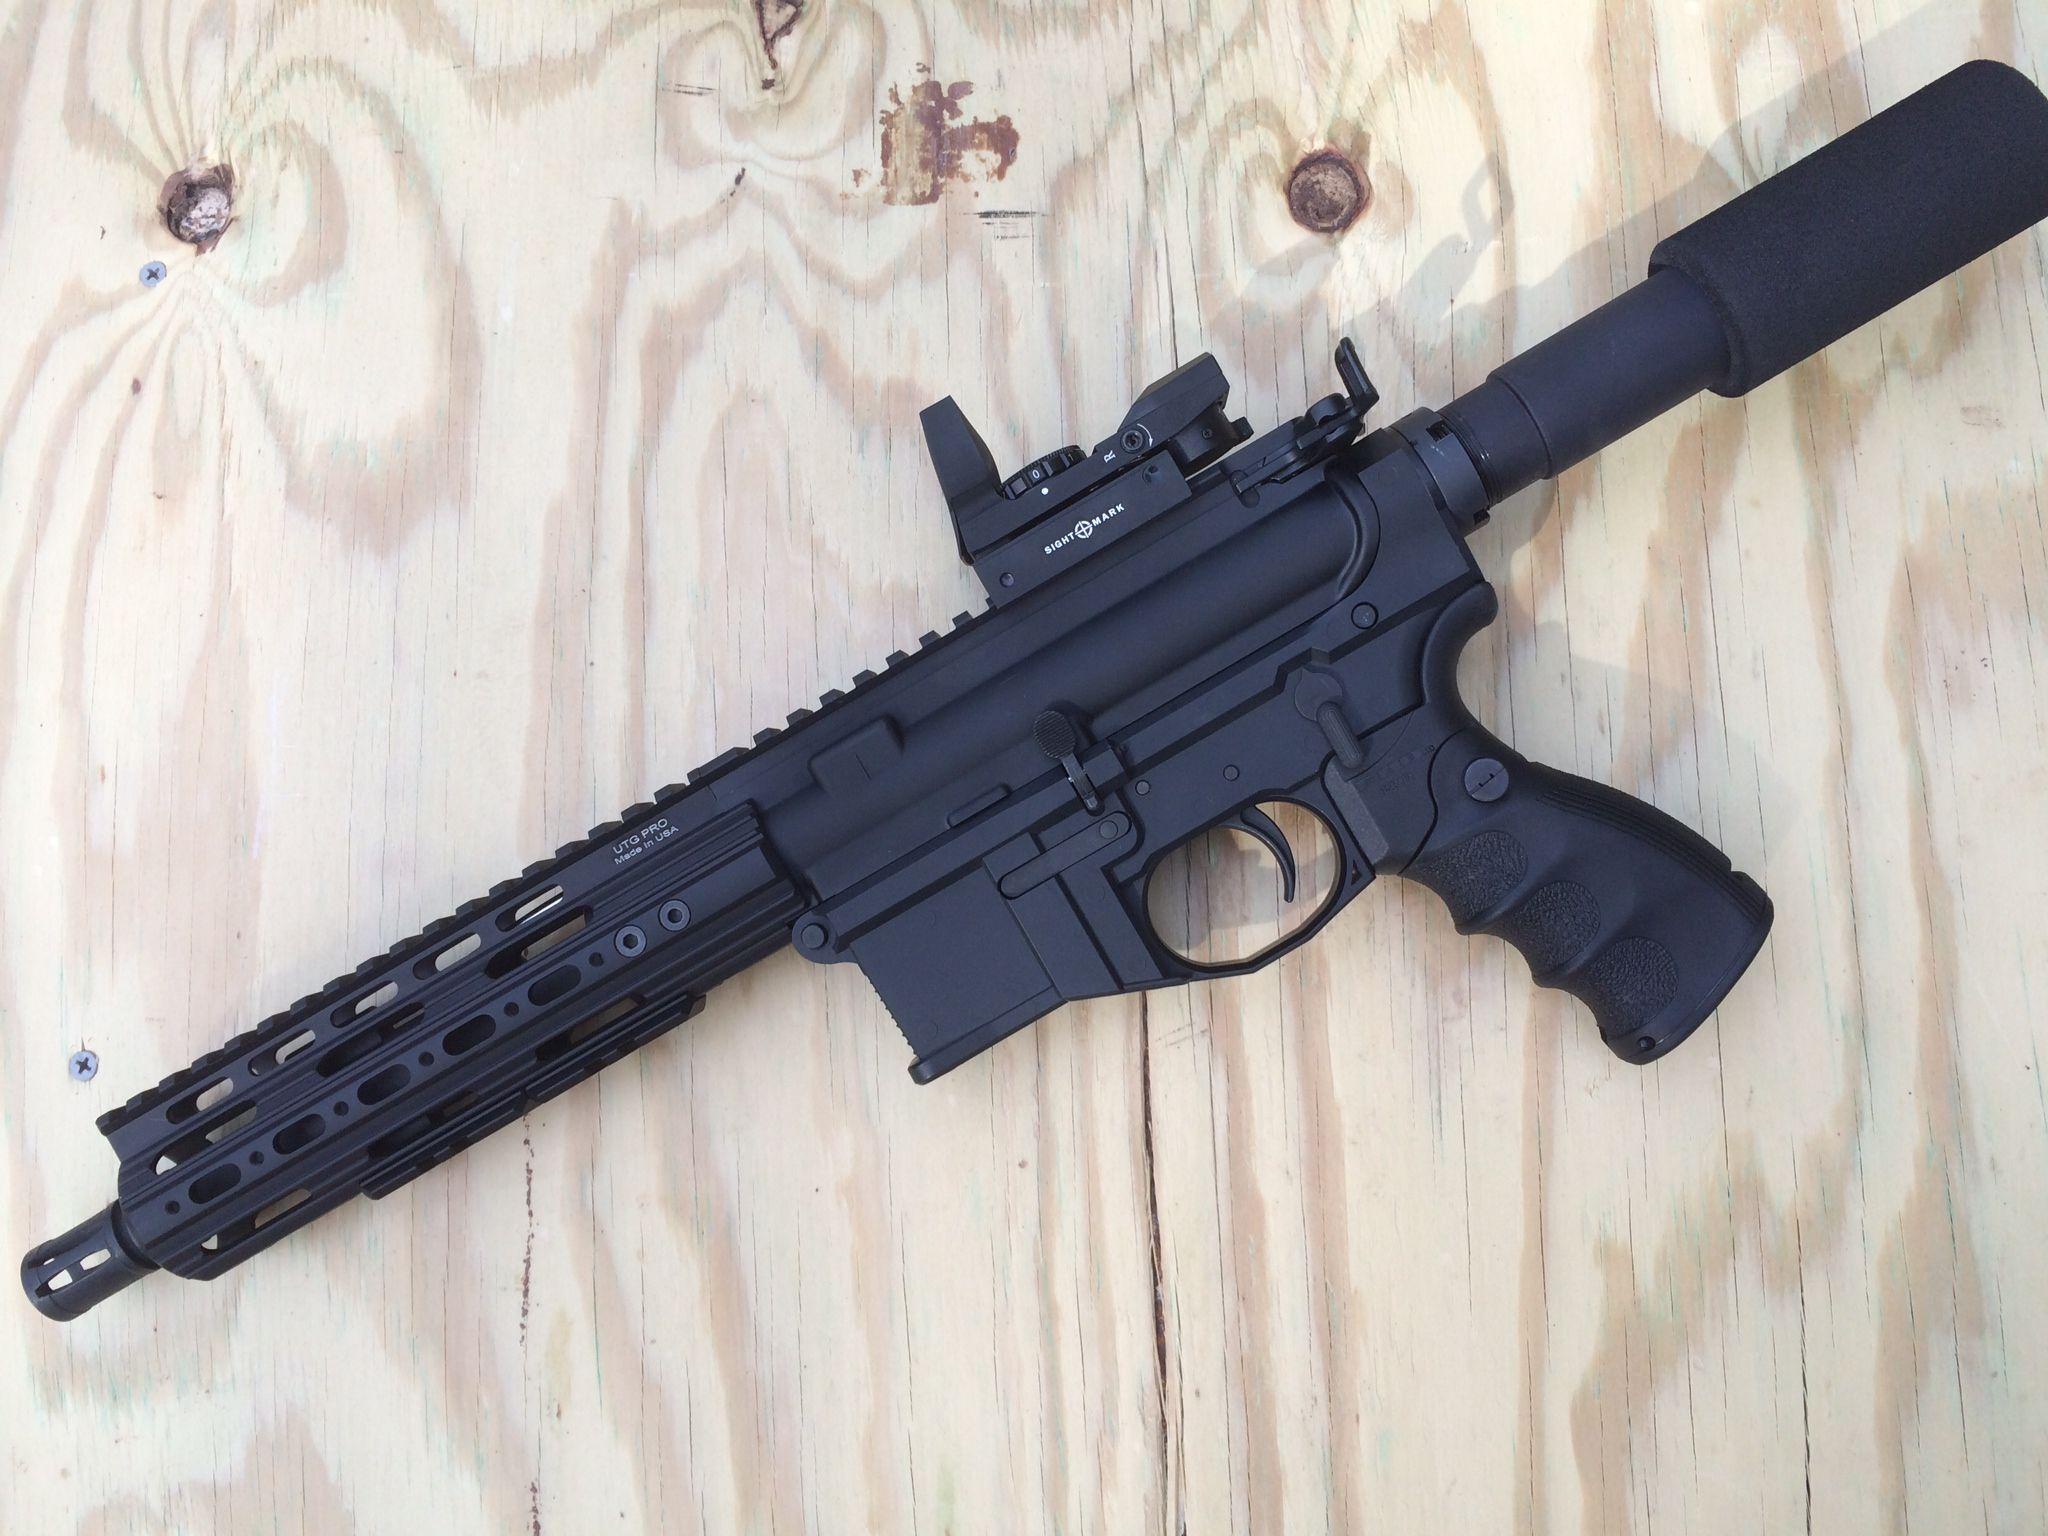 AR Pistol- w/ Polymer80 lower, UTG rails | Build your own